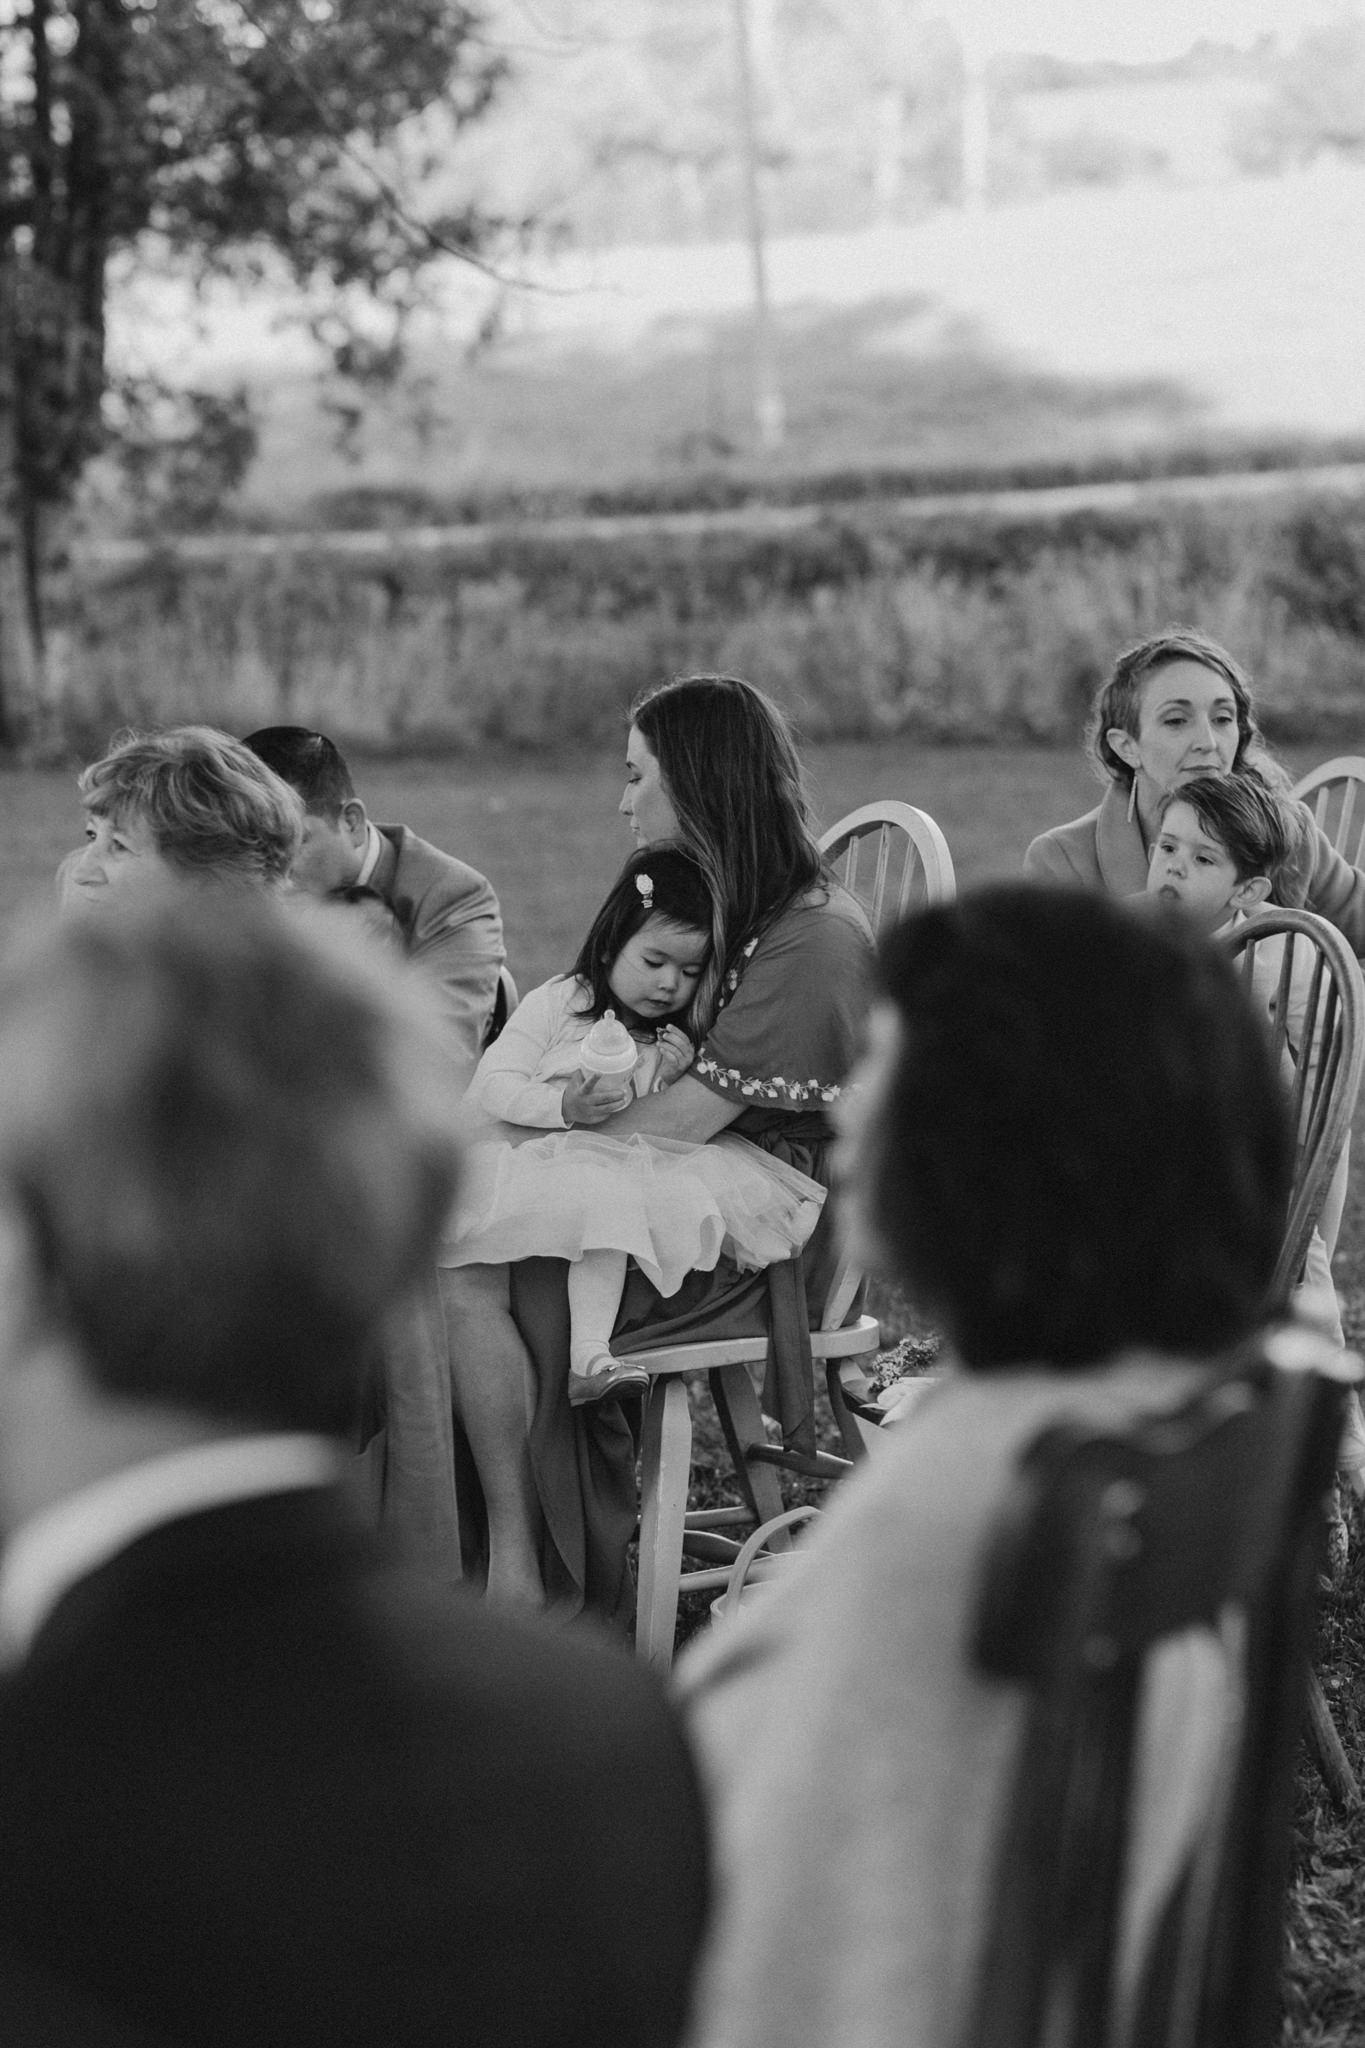 little girl asleep on mothers lap at wedding